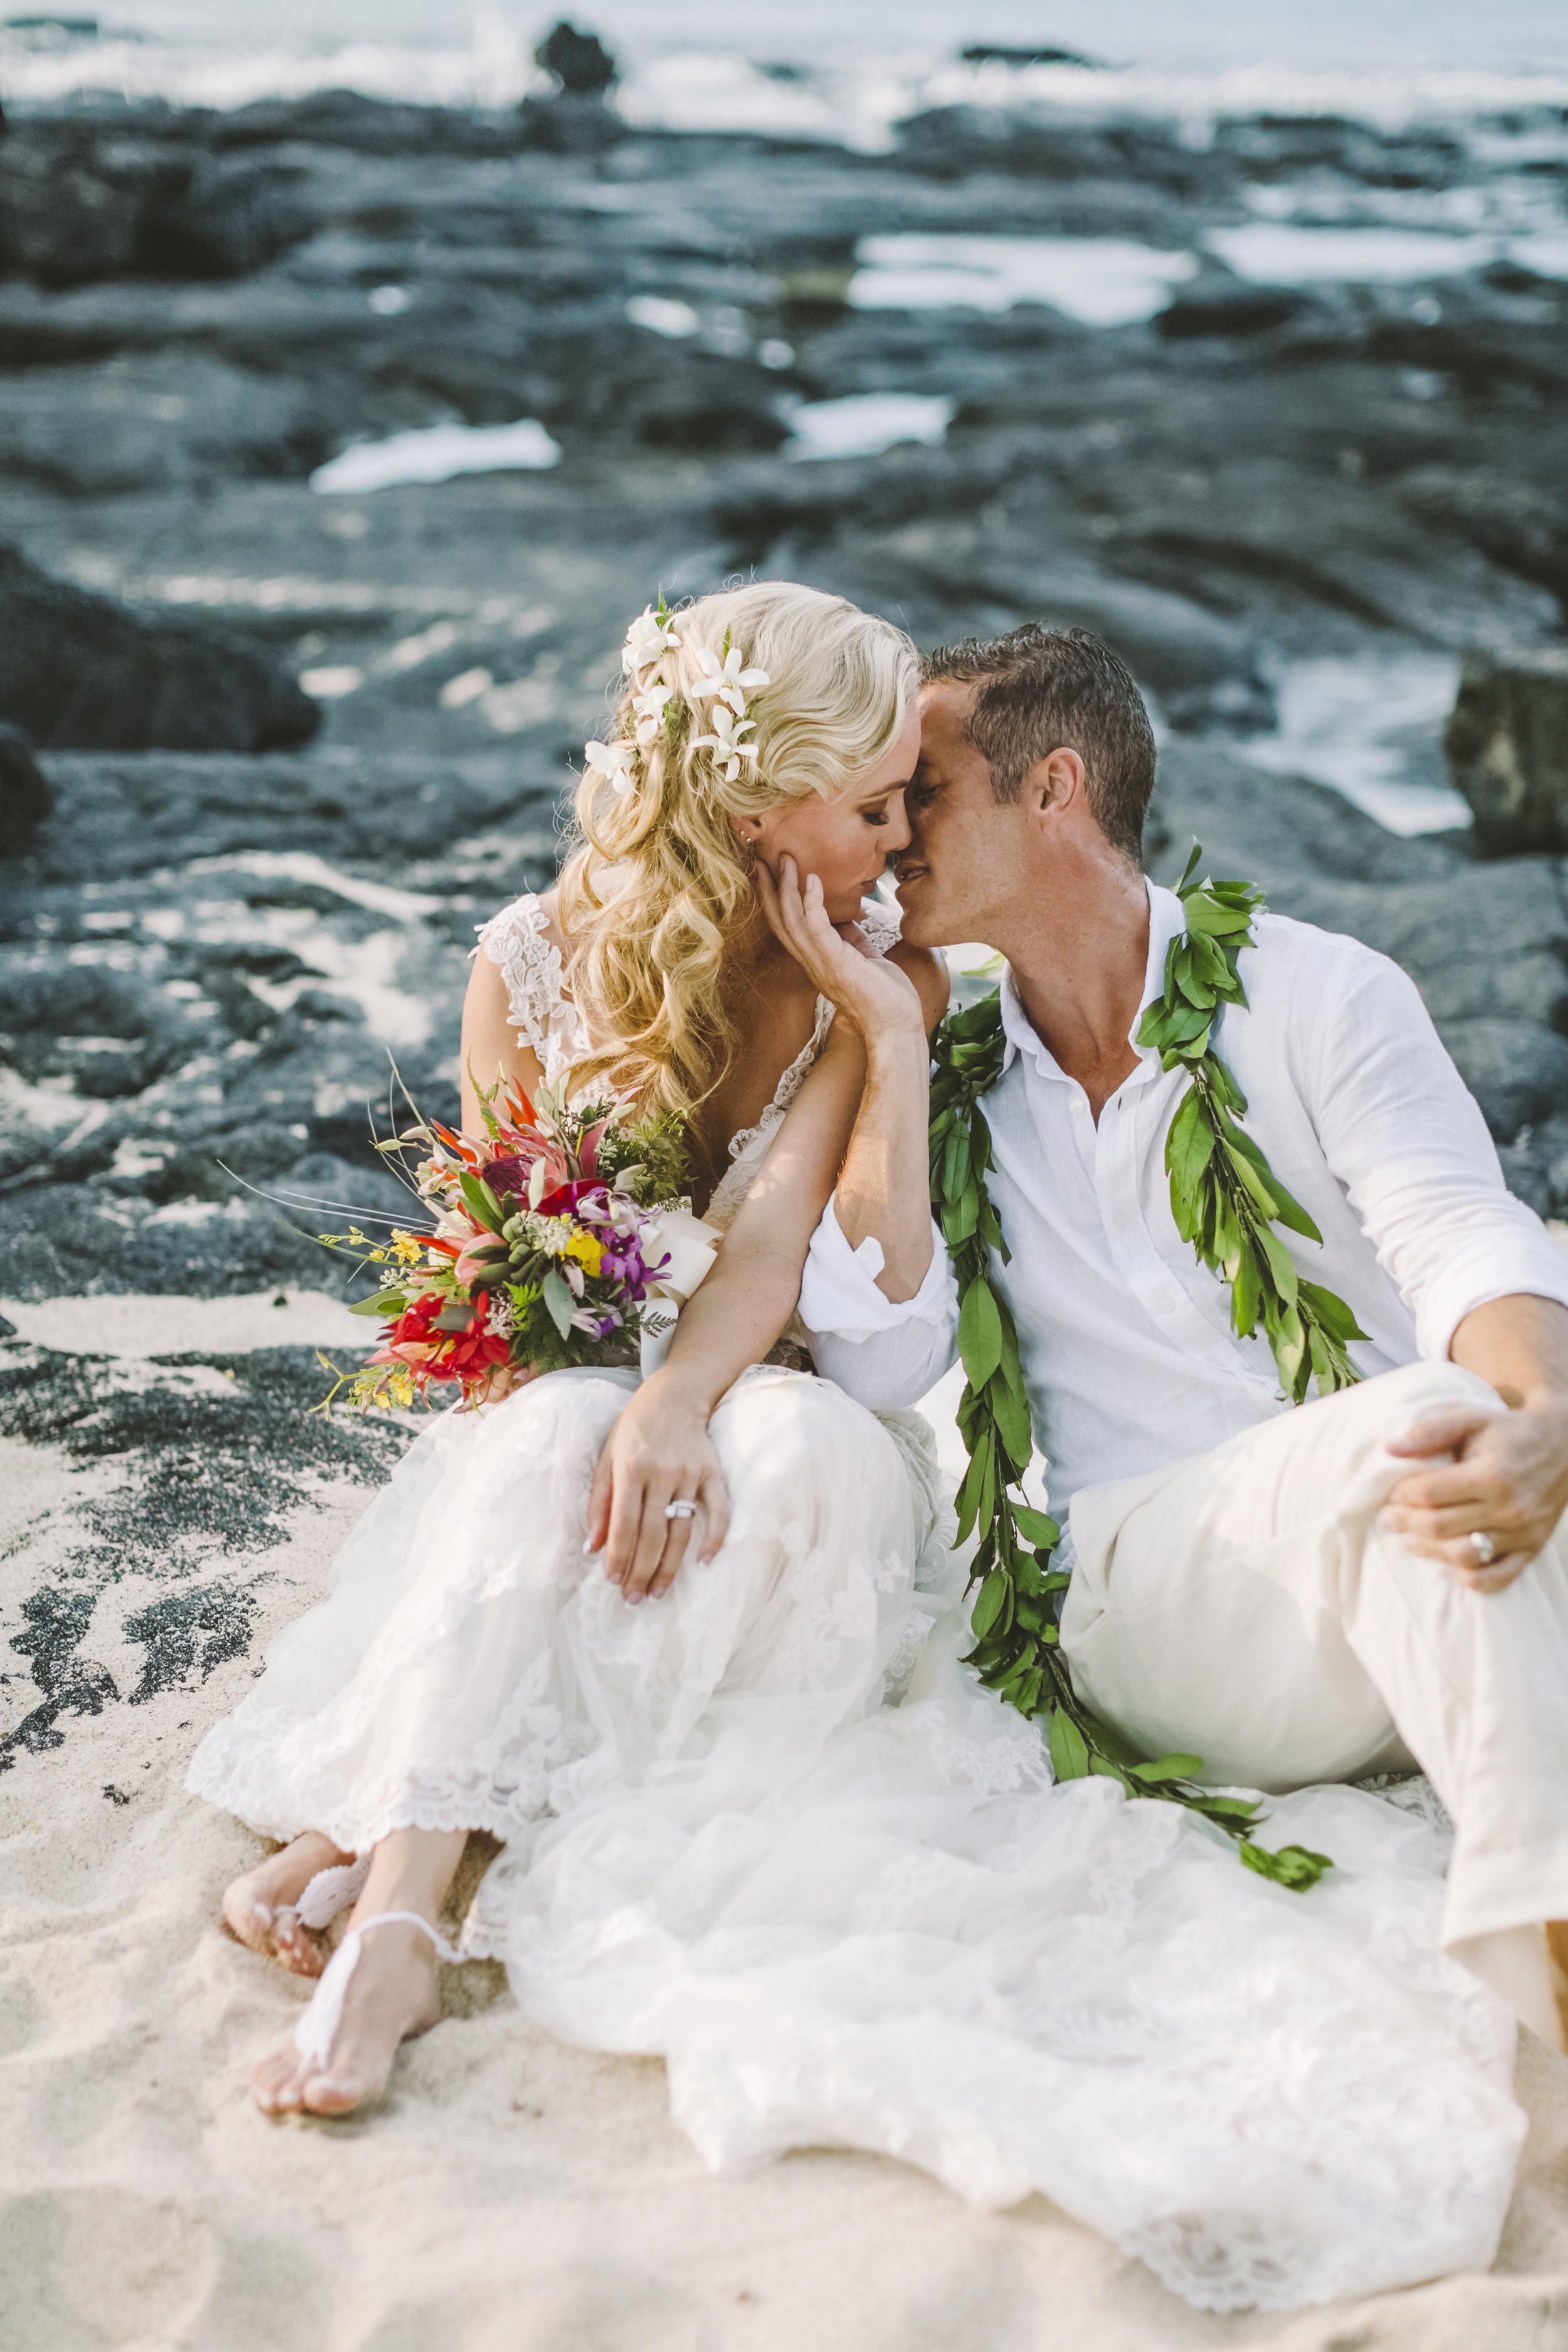 angie-diaz-photography-hawaii-wedding-photographer-kelli-jay-95.jpg